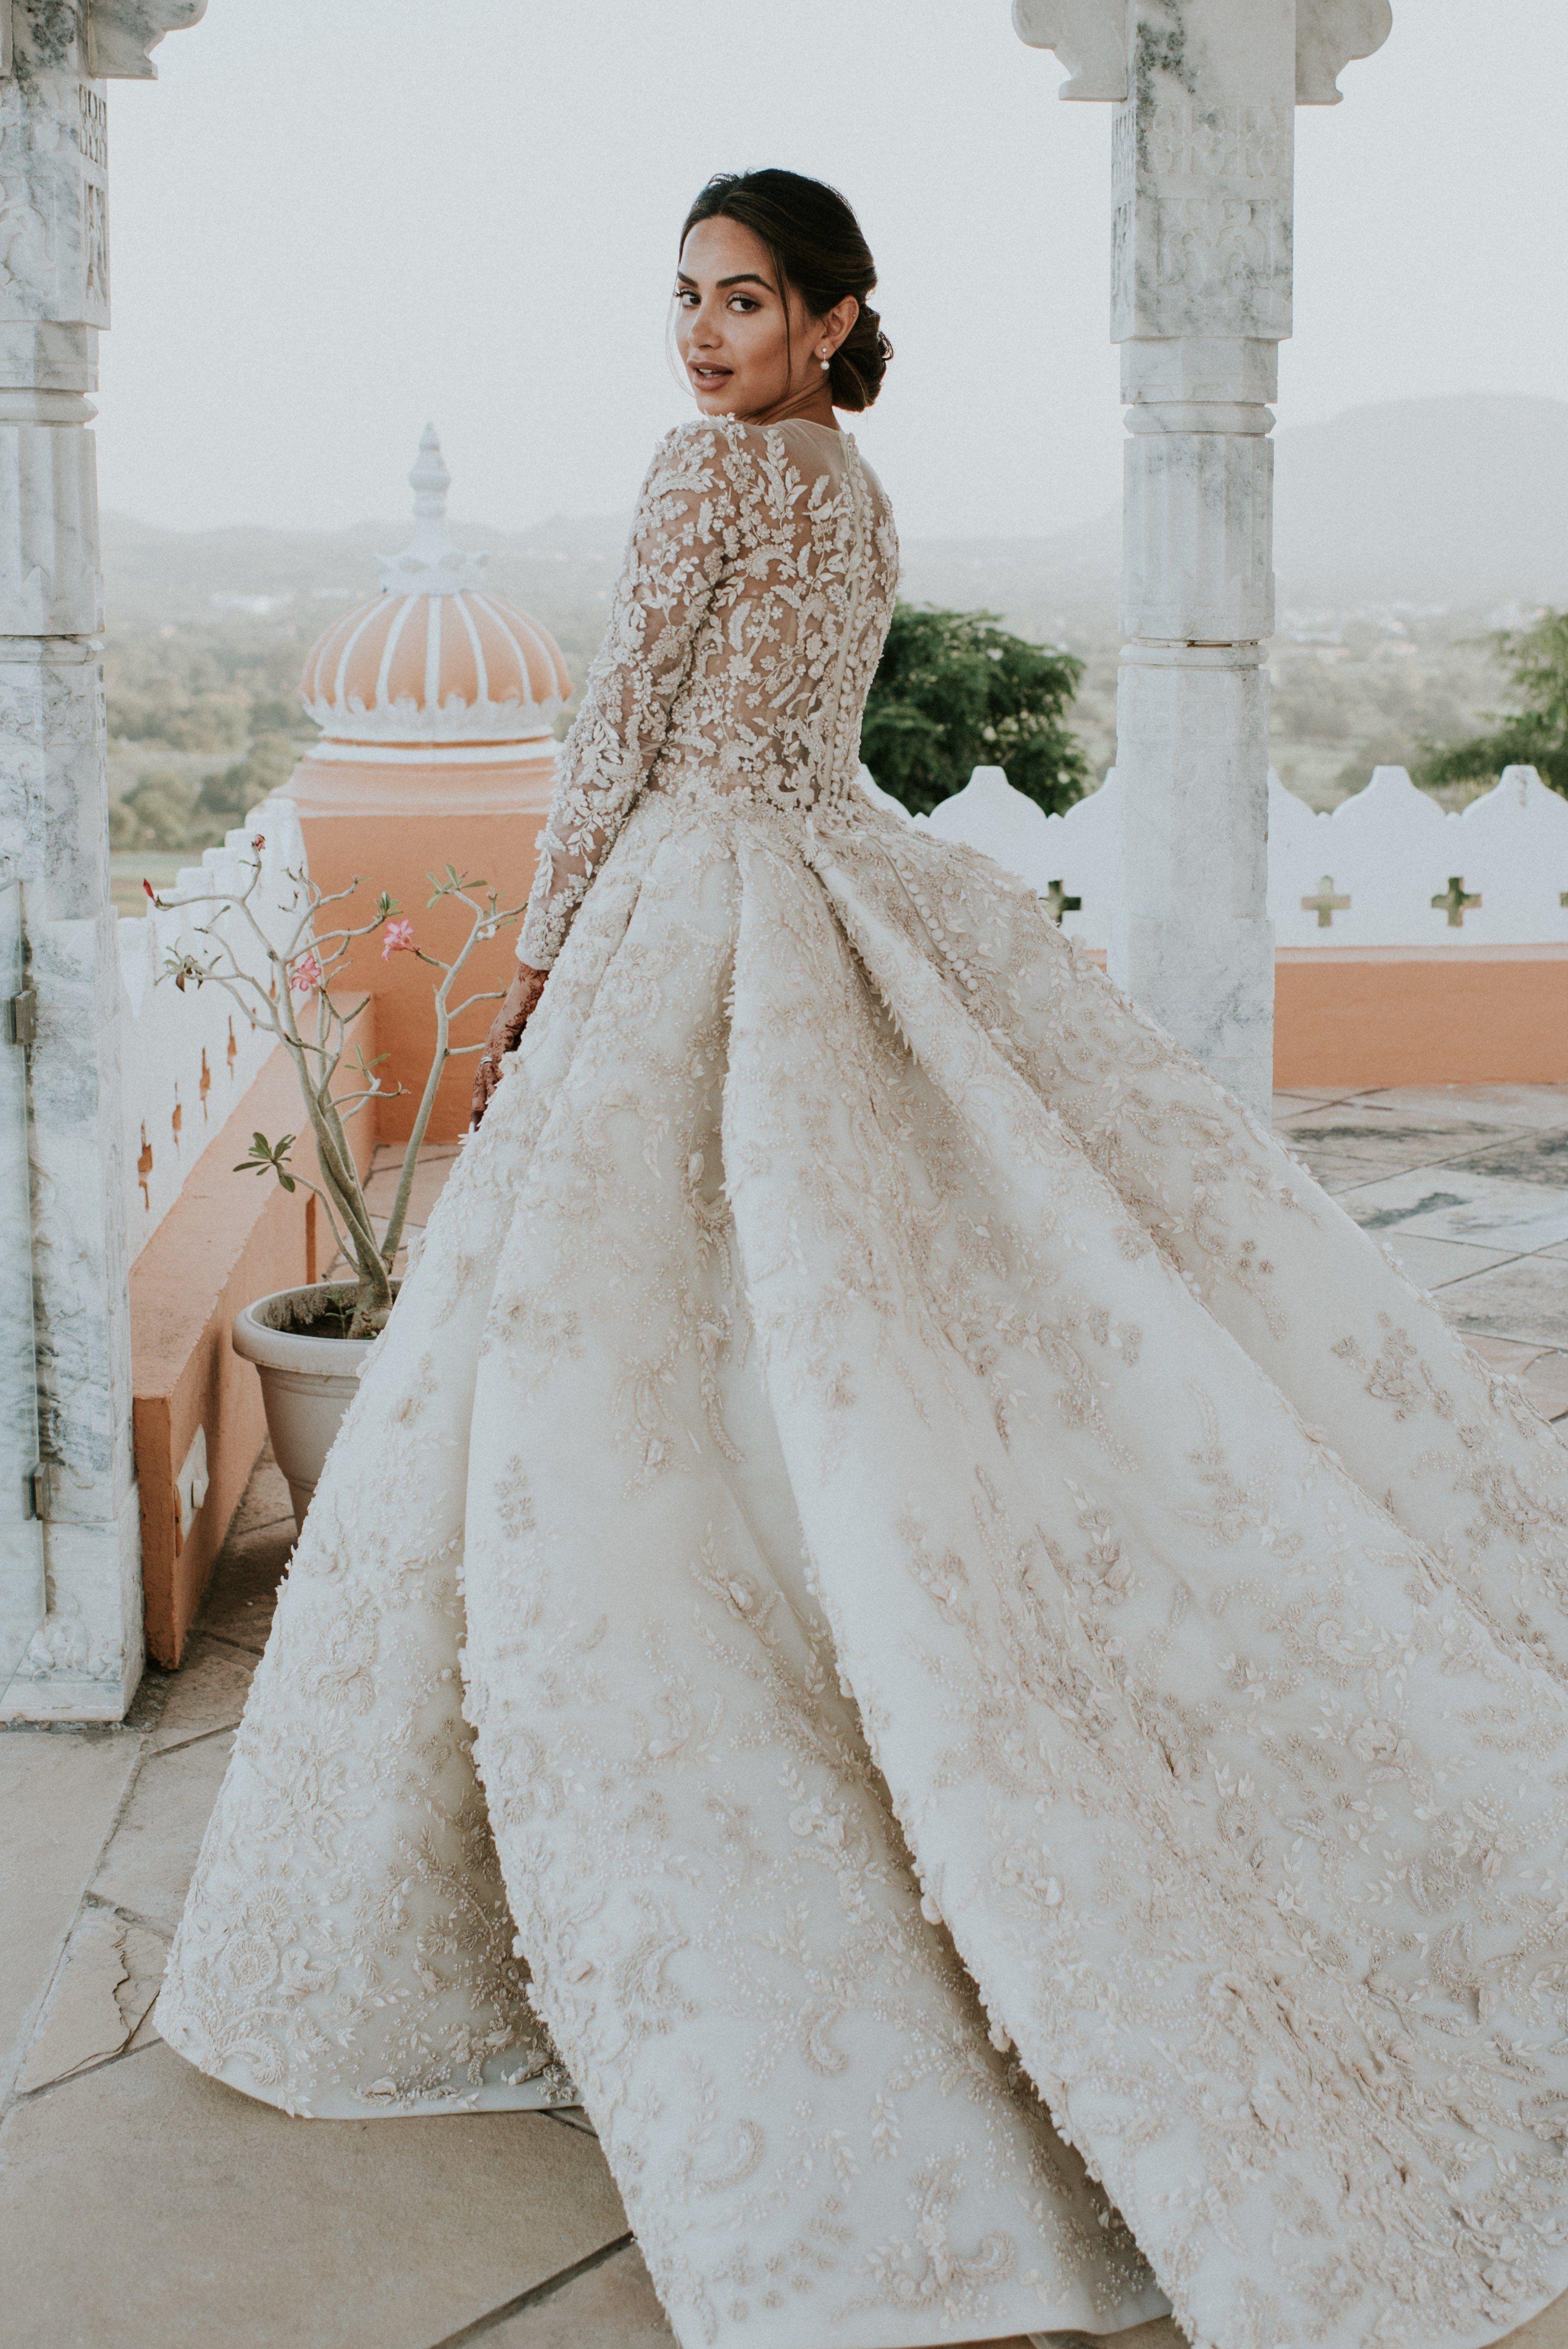 Wedding Video Award On Twitter Indian Wedding Gowns Wedding Dress Long Sleeve Dream Wedding Dresses [ 4493 x 2999 Pixel ]